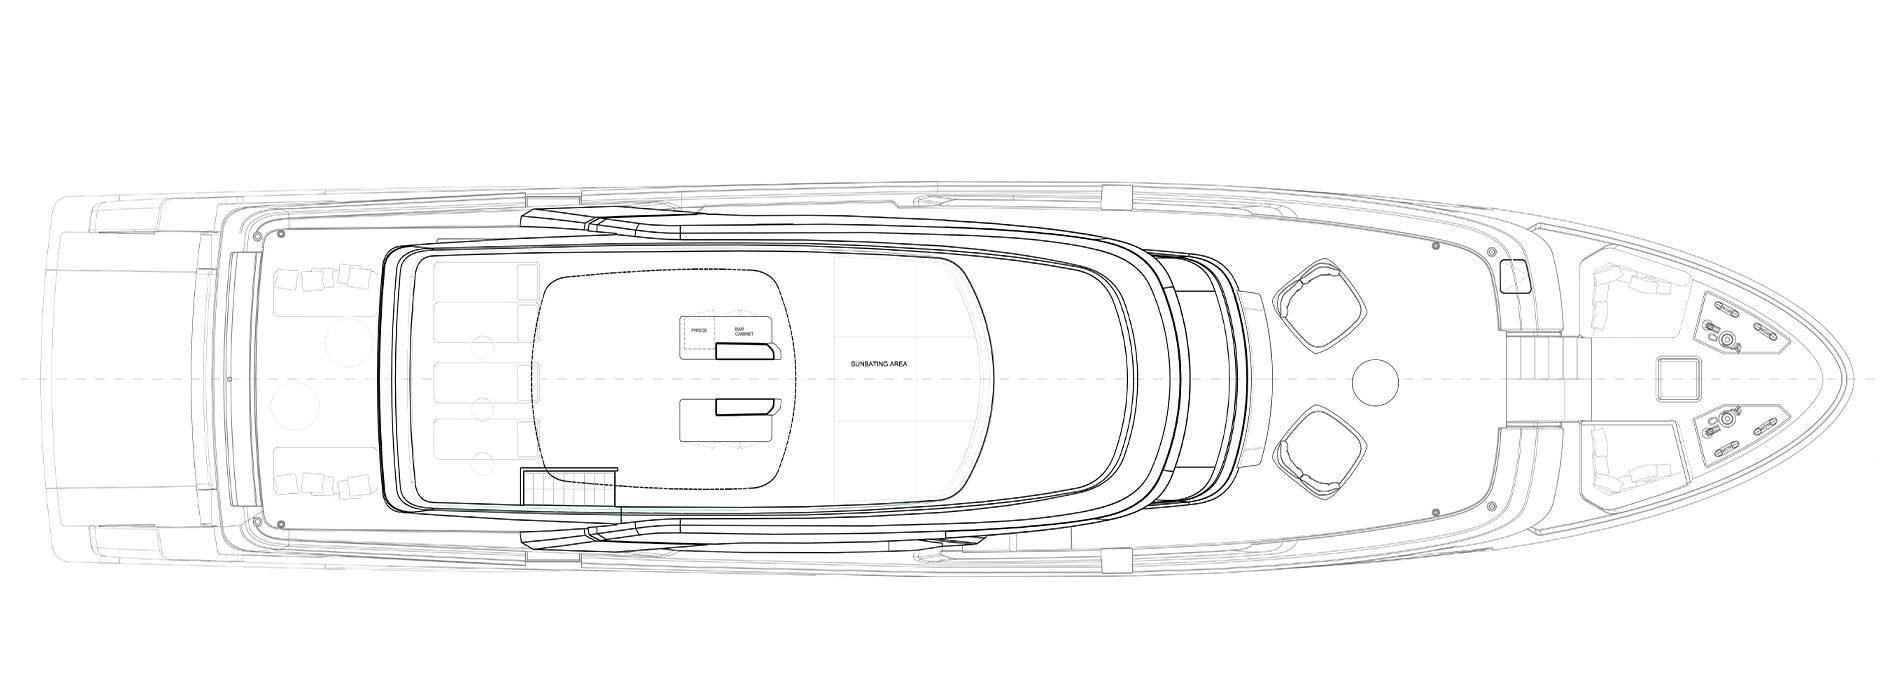 Sanlorenzo Yachts SD118 Флайбридж